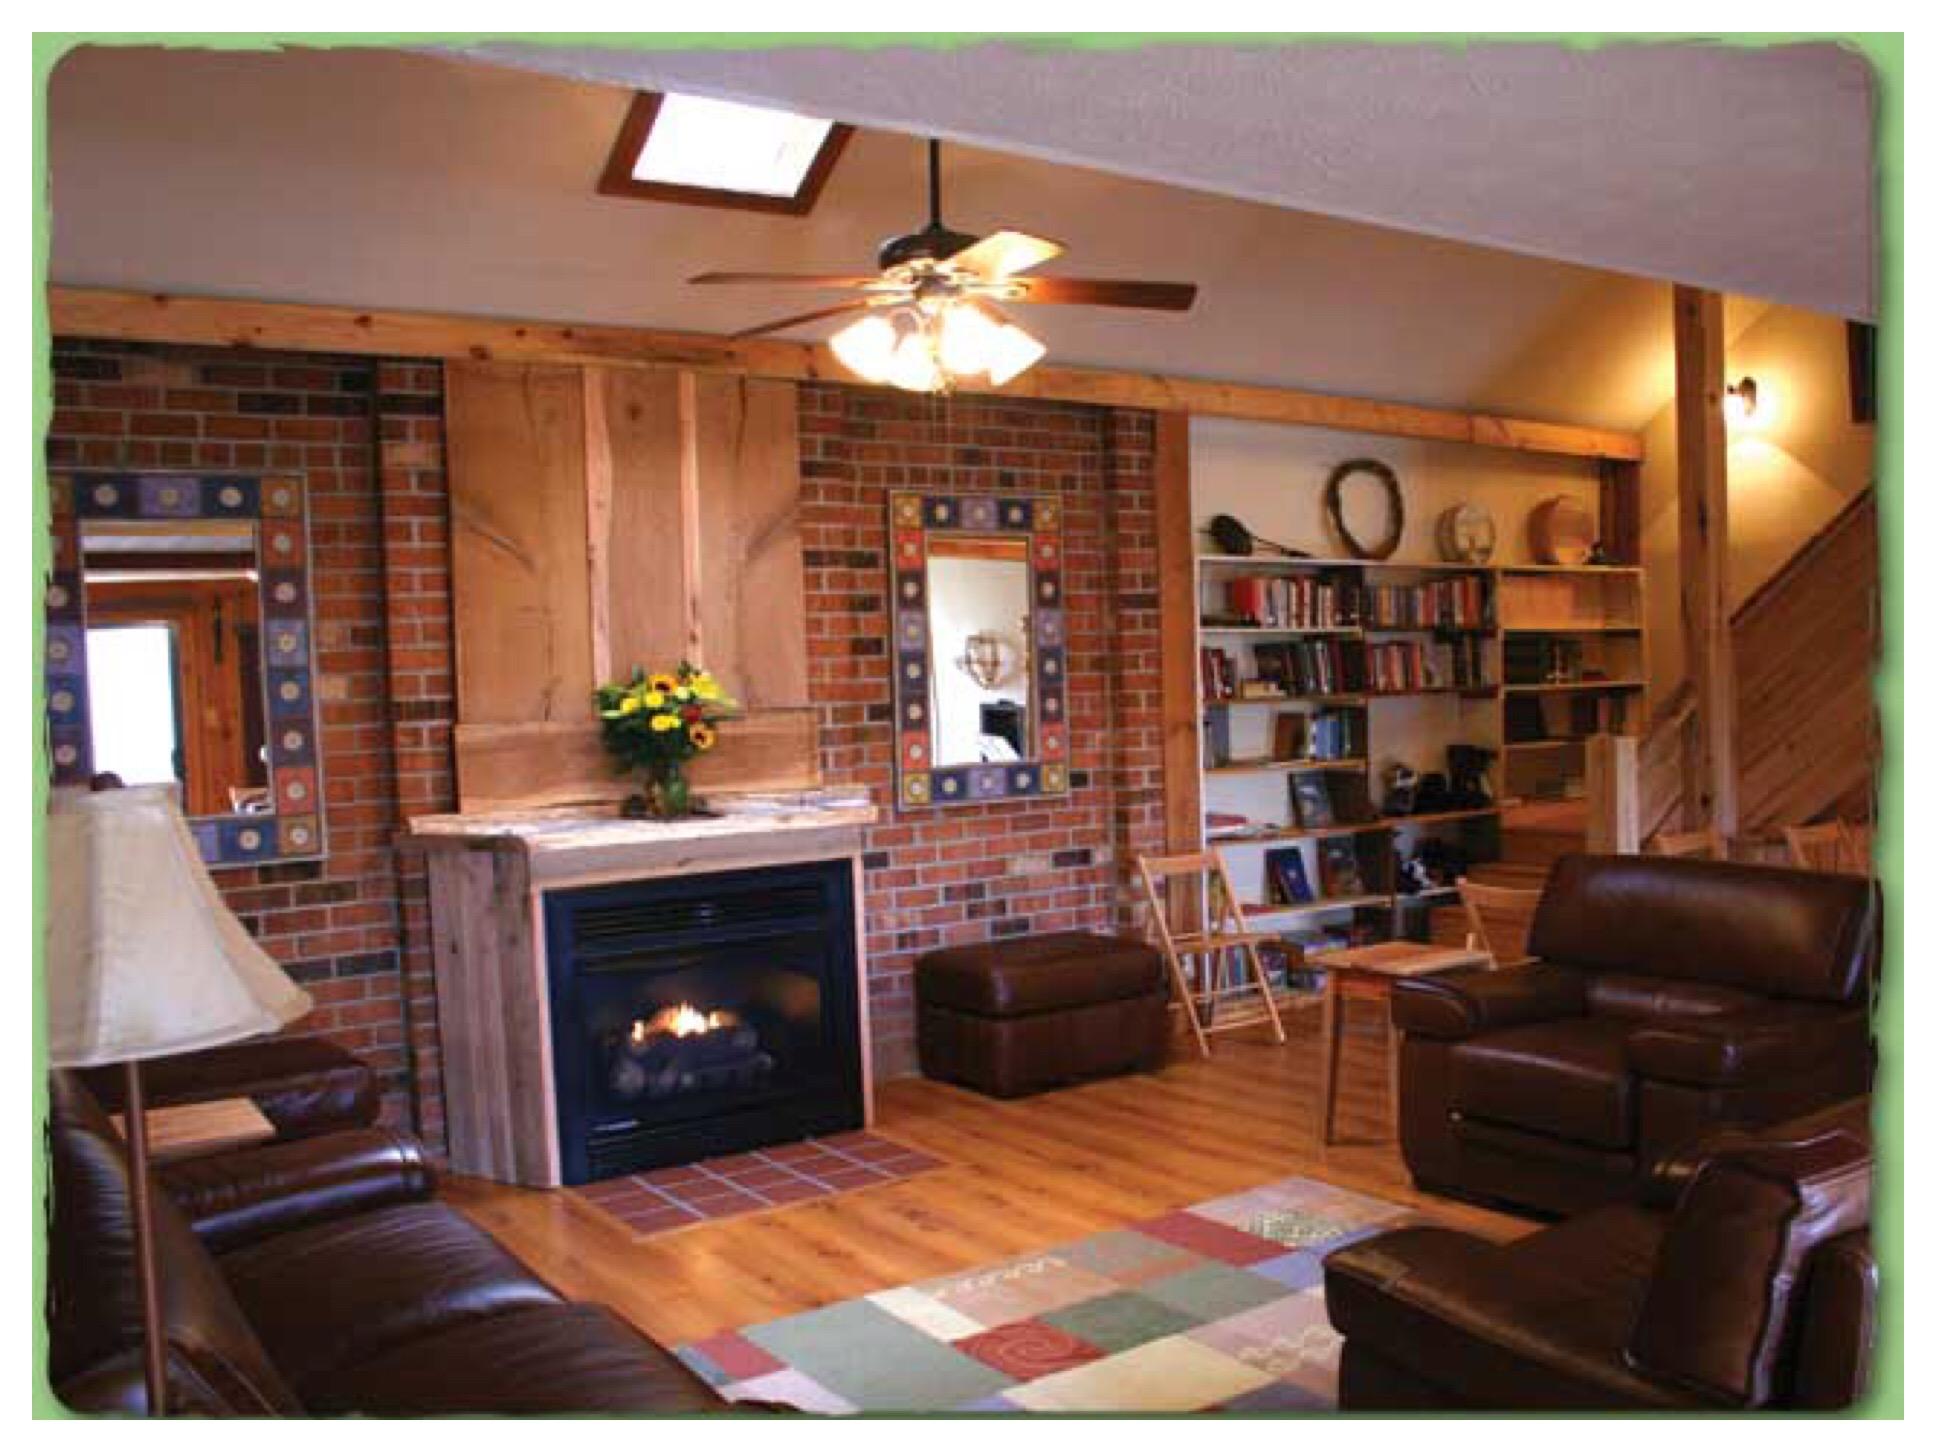 Rockcliffe Farm Retreat & Lodge - Lodge Living